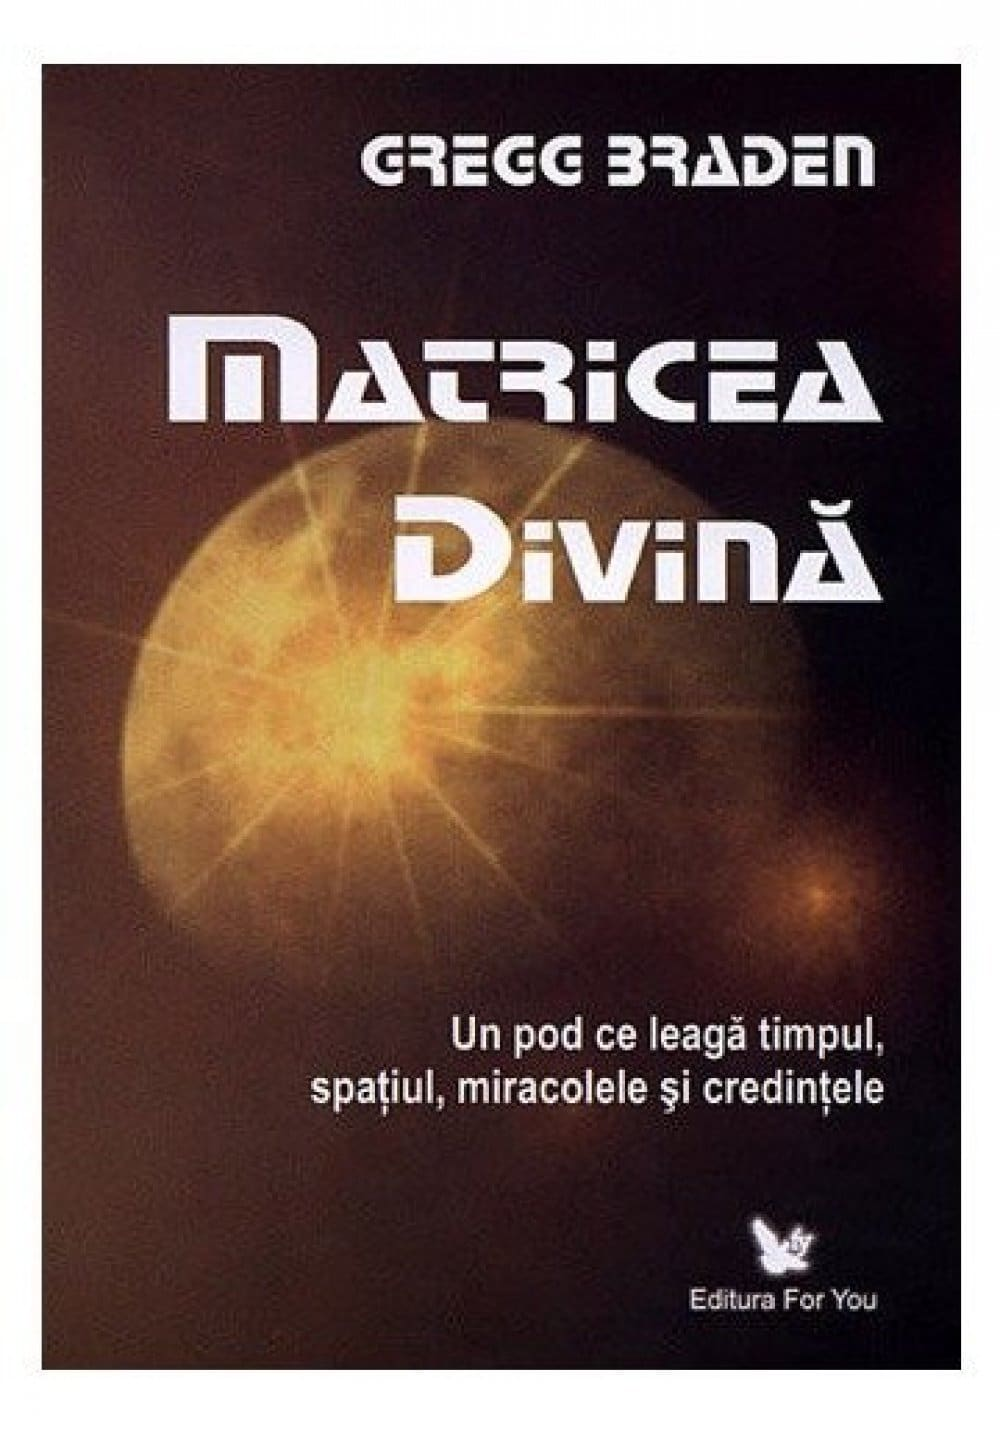 matricea-divina-gregg-braden